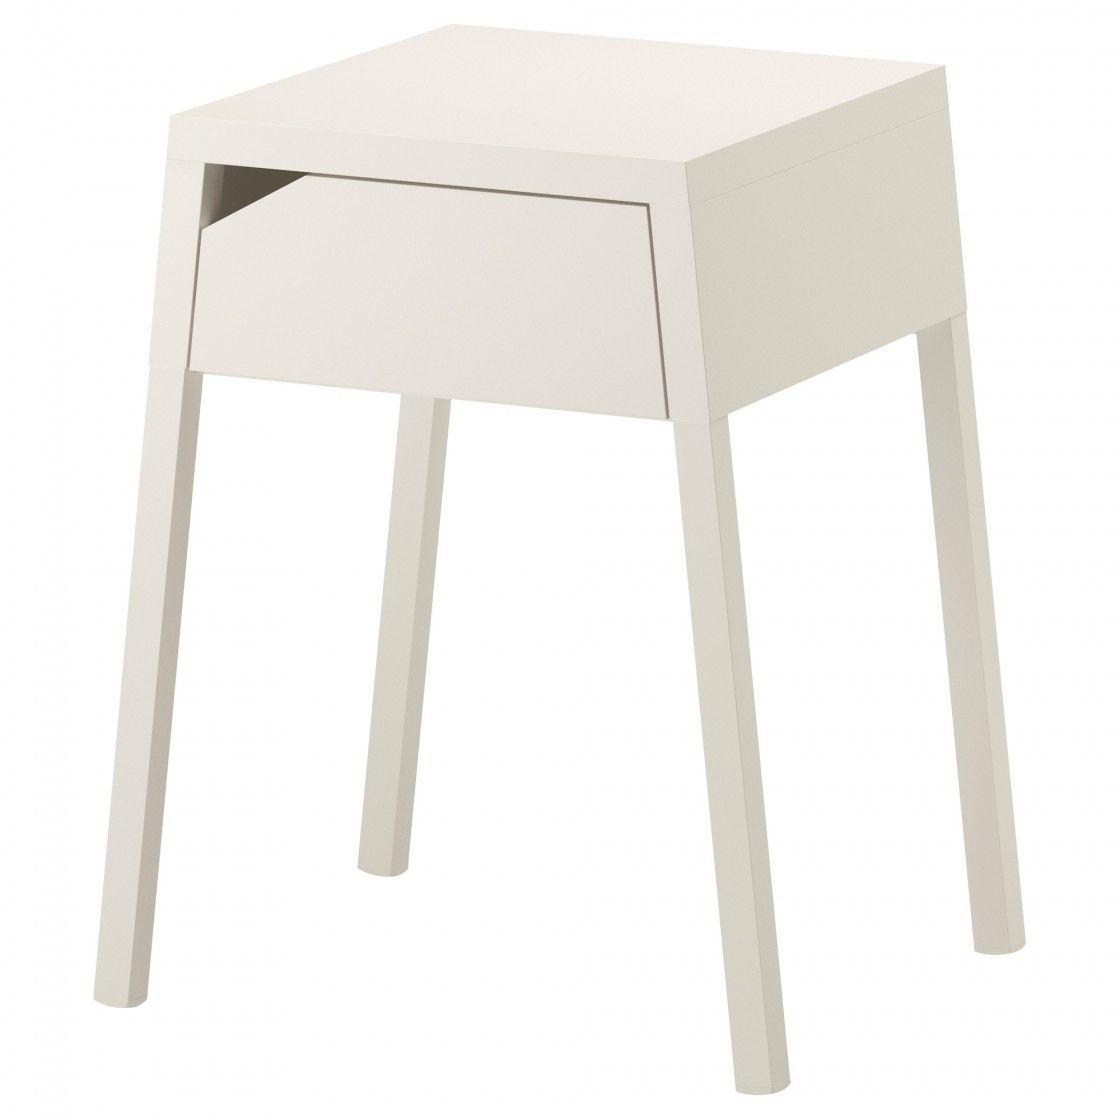 Brilliant IKEA Bedside Table Design Brilliant IKEA Bedside Table